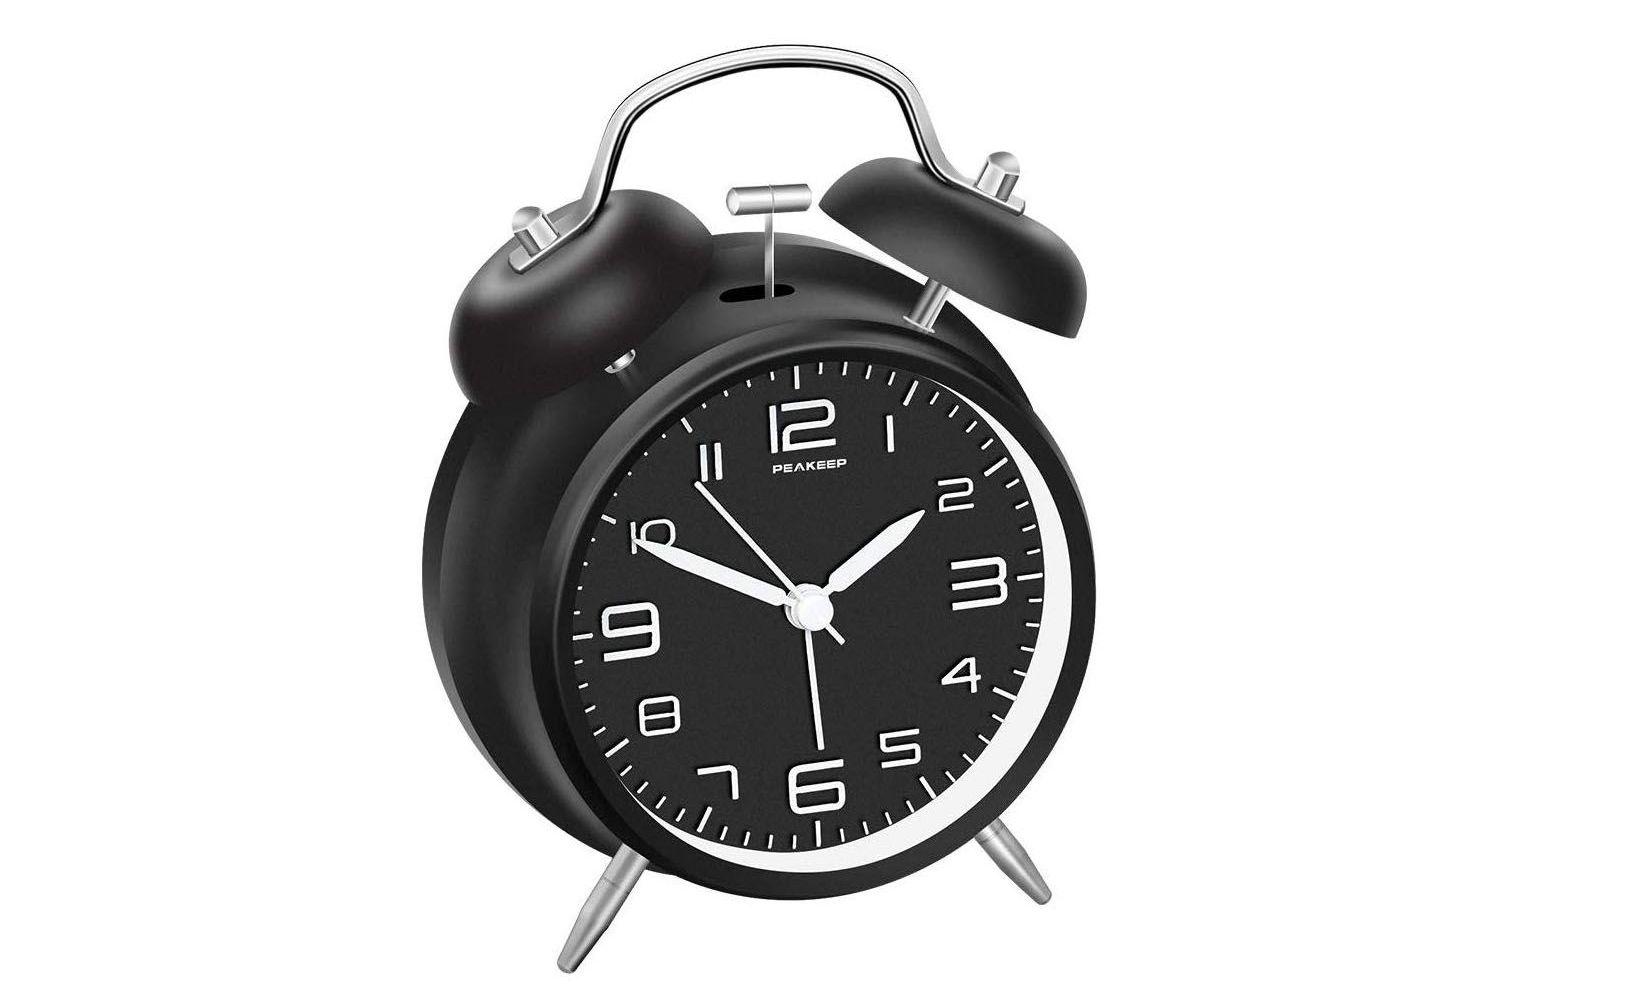 10 Best Loud Alarm Clocks For Heavy Sleepers 2019